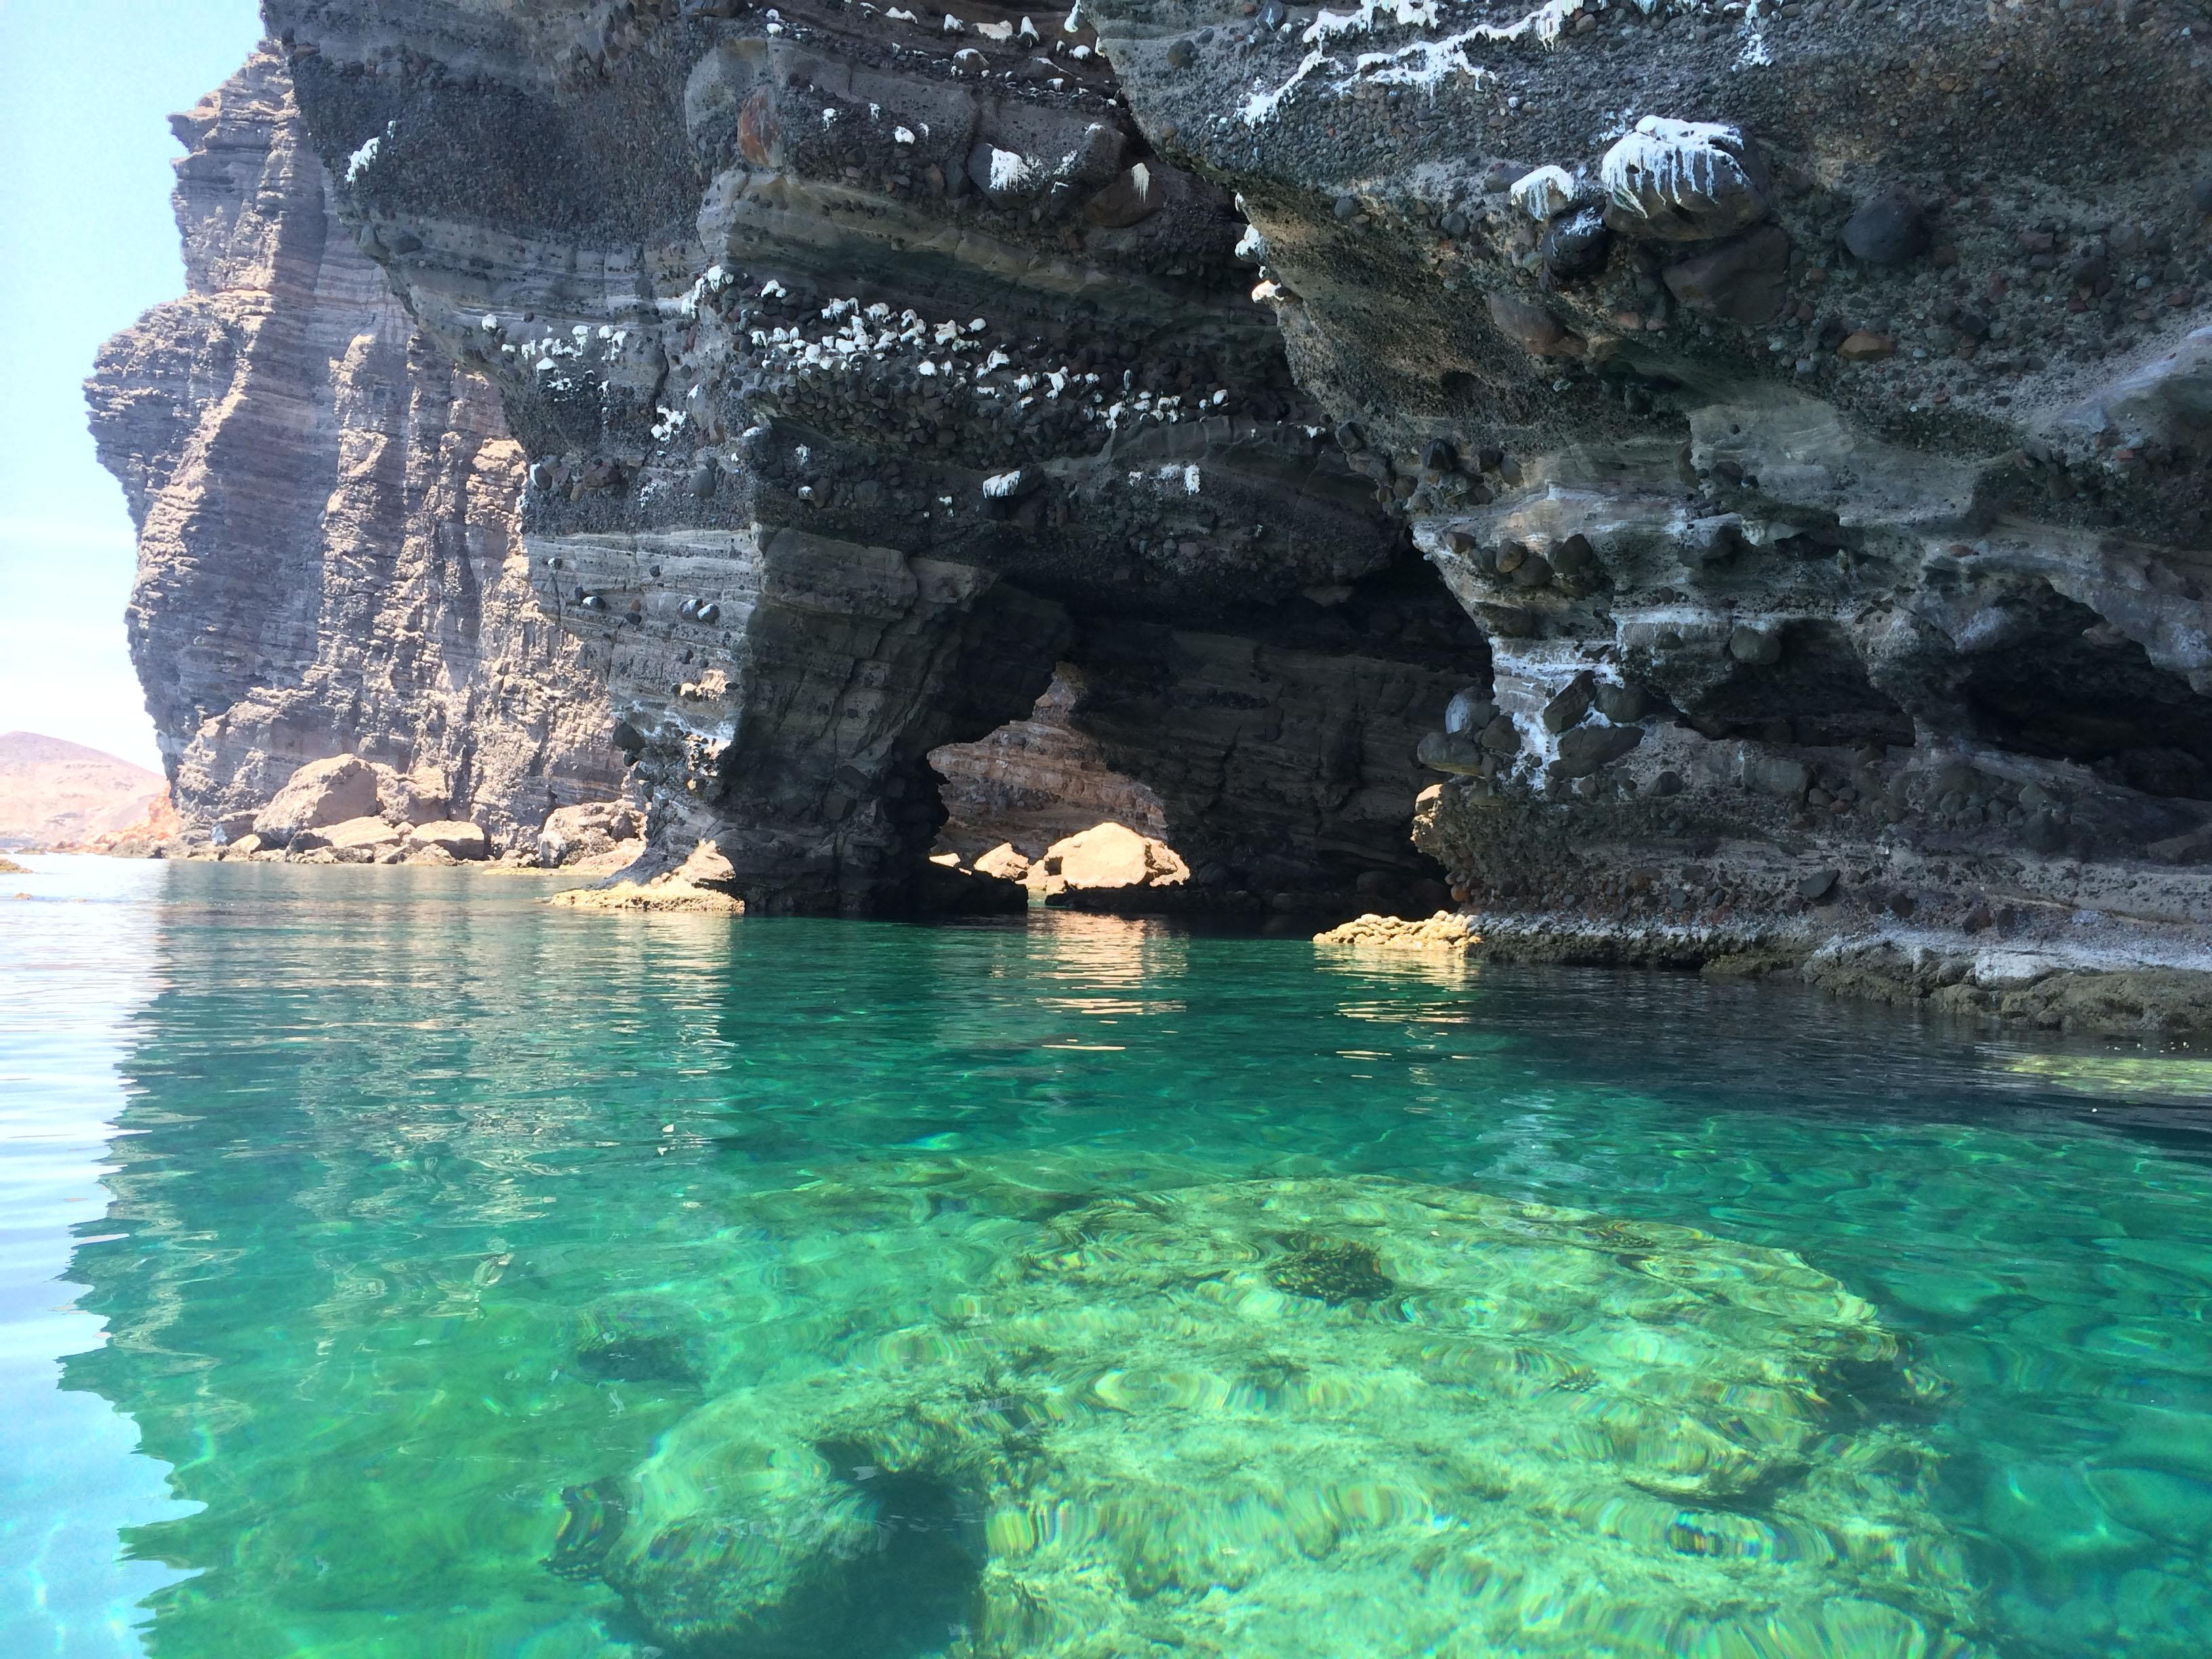 Esp Santo caves water2